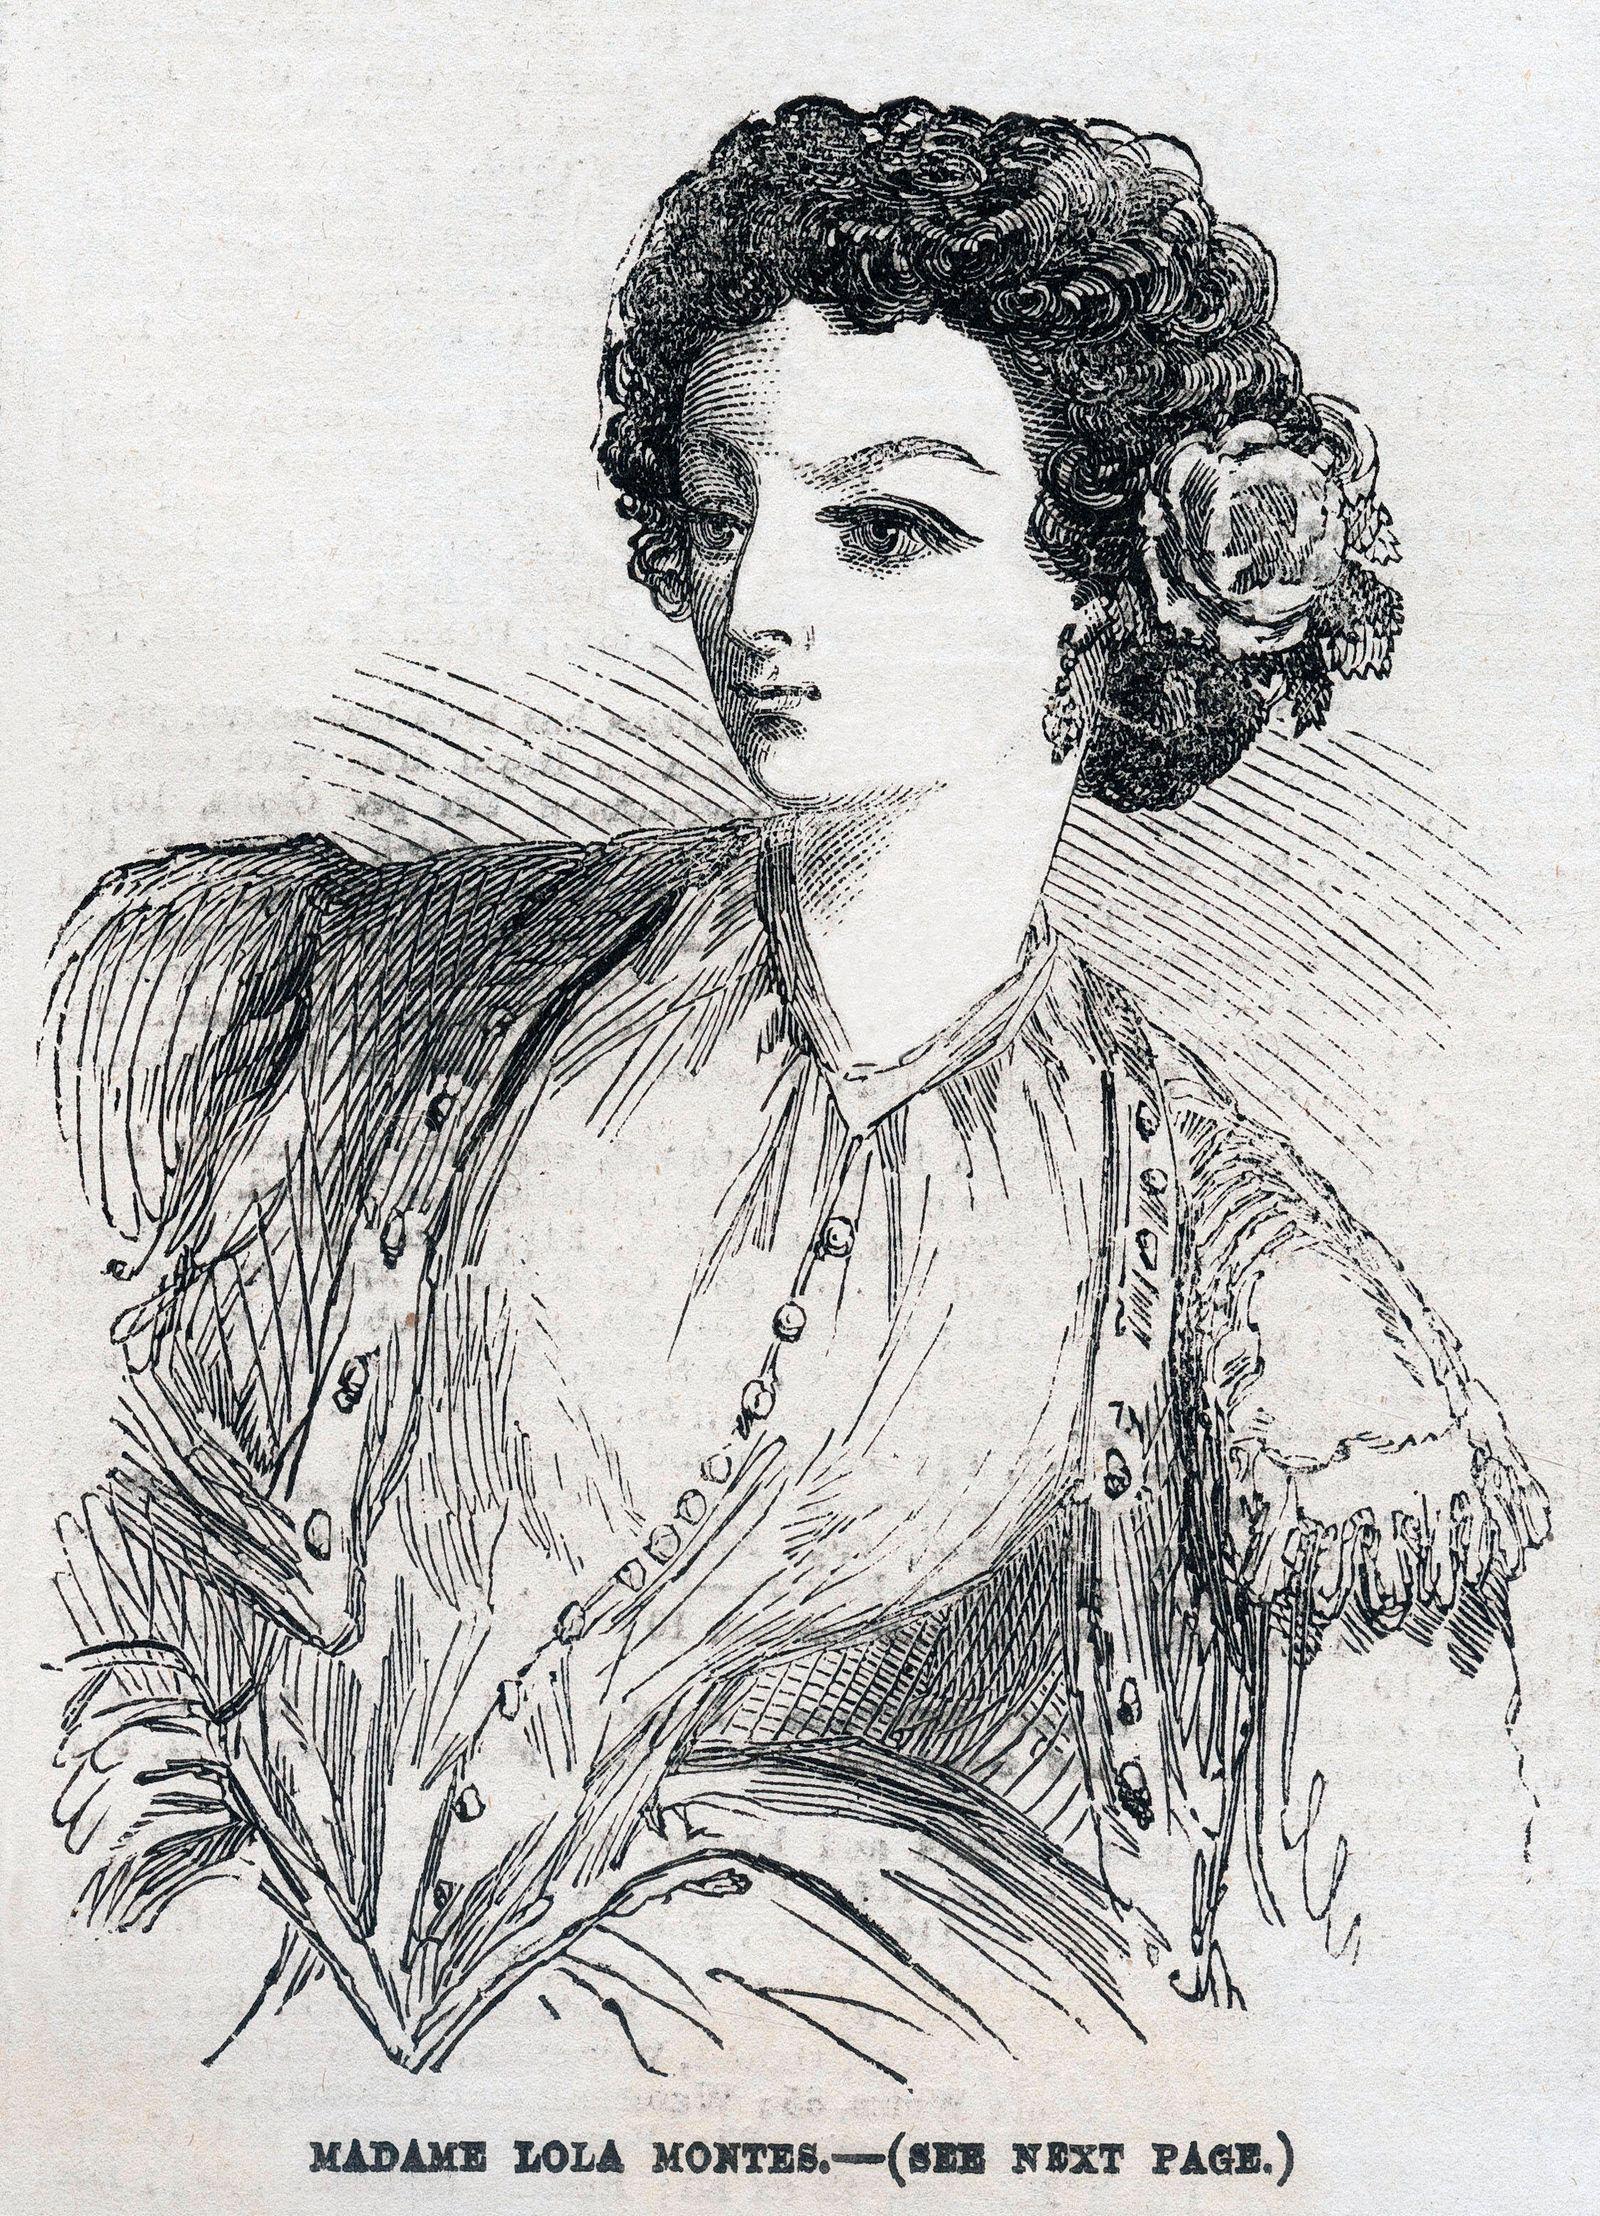 Lola MONTES Madame Lola MONTES (1818-1861). Illustration anonyme pour L Illustrated London News du 26 janvier 1856. Cred